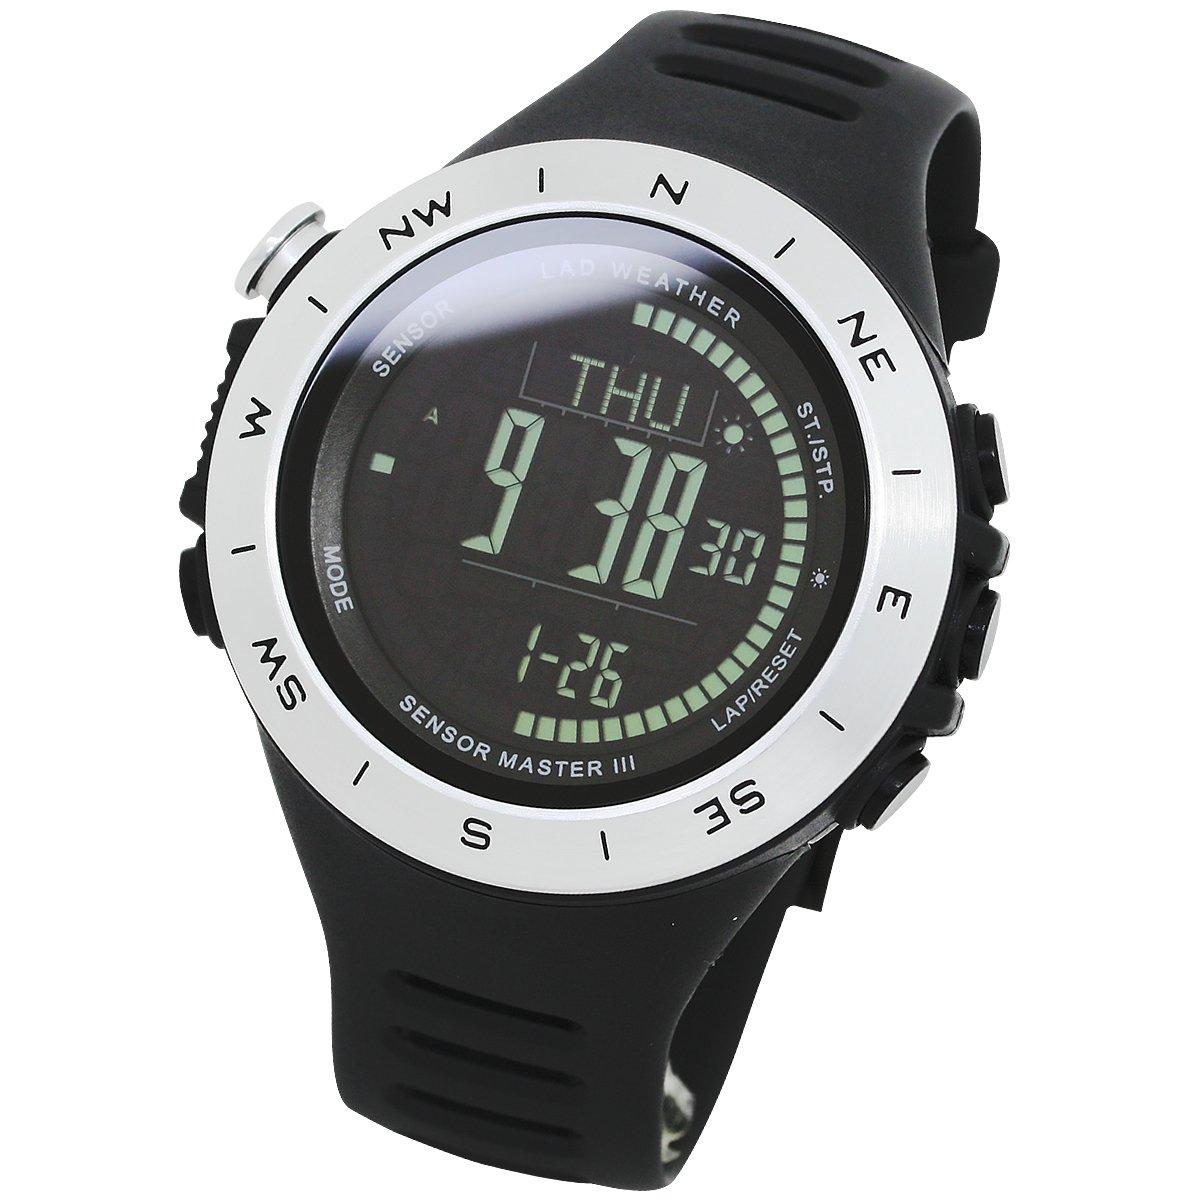 [LAD WEATHER] Sensor suizo Altímetro Barómetro Brújula digital 3D podómetro cuentakilómetros caloría deportivo reloj